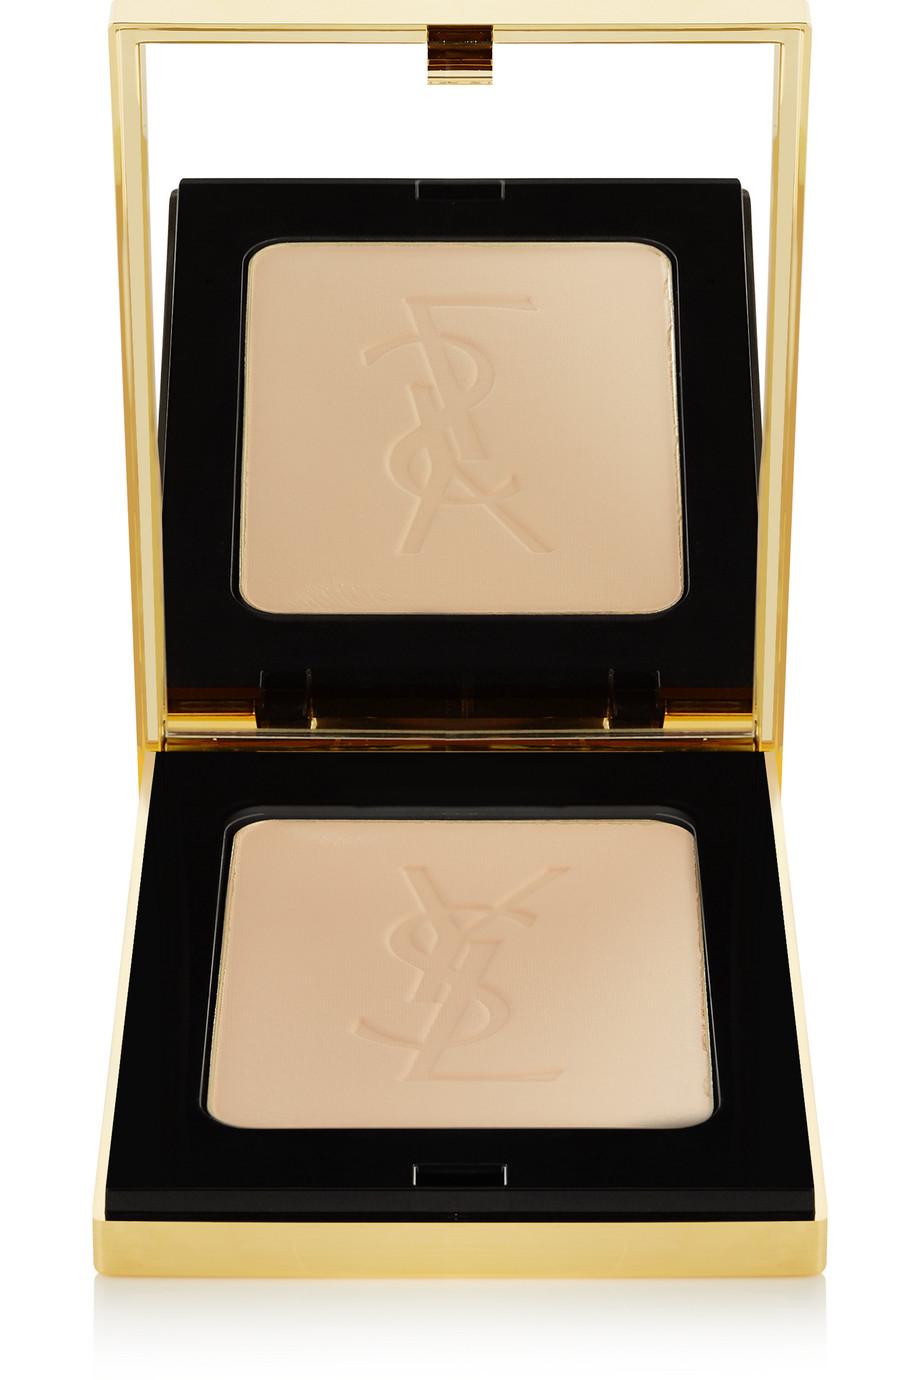 Poudre Compacte Radiance - Beige 3, by Yves Saint Laurent Beauty